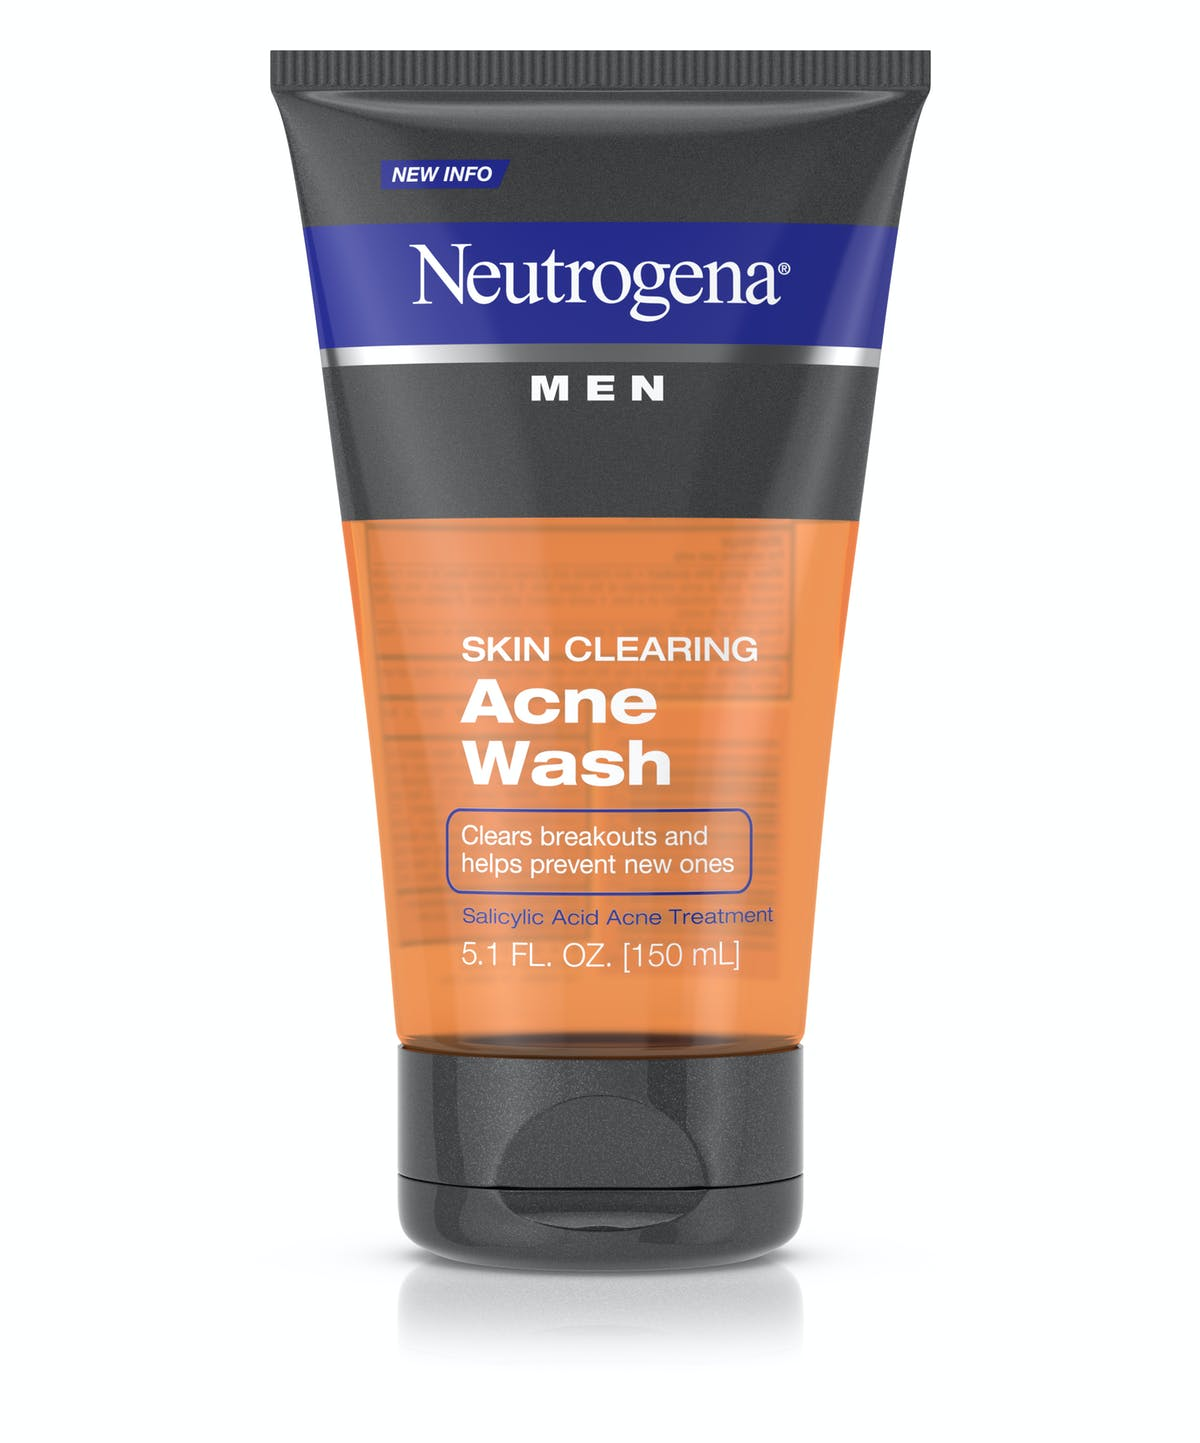 Men Skin Clearing Acne Wash Neutrogena